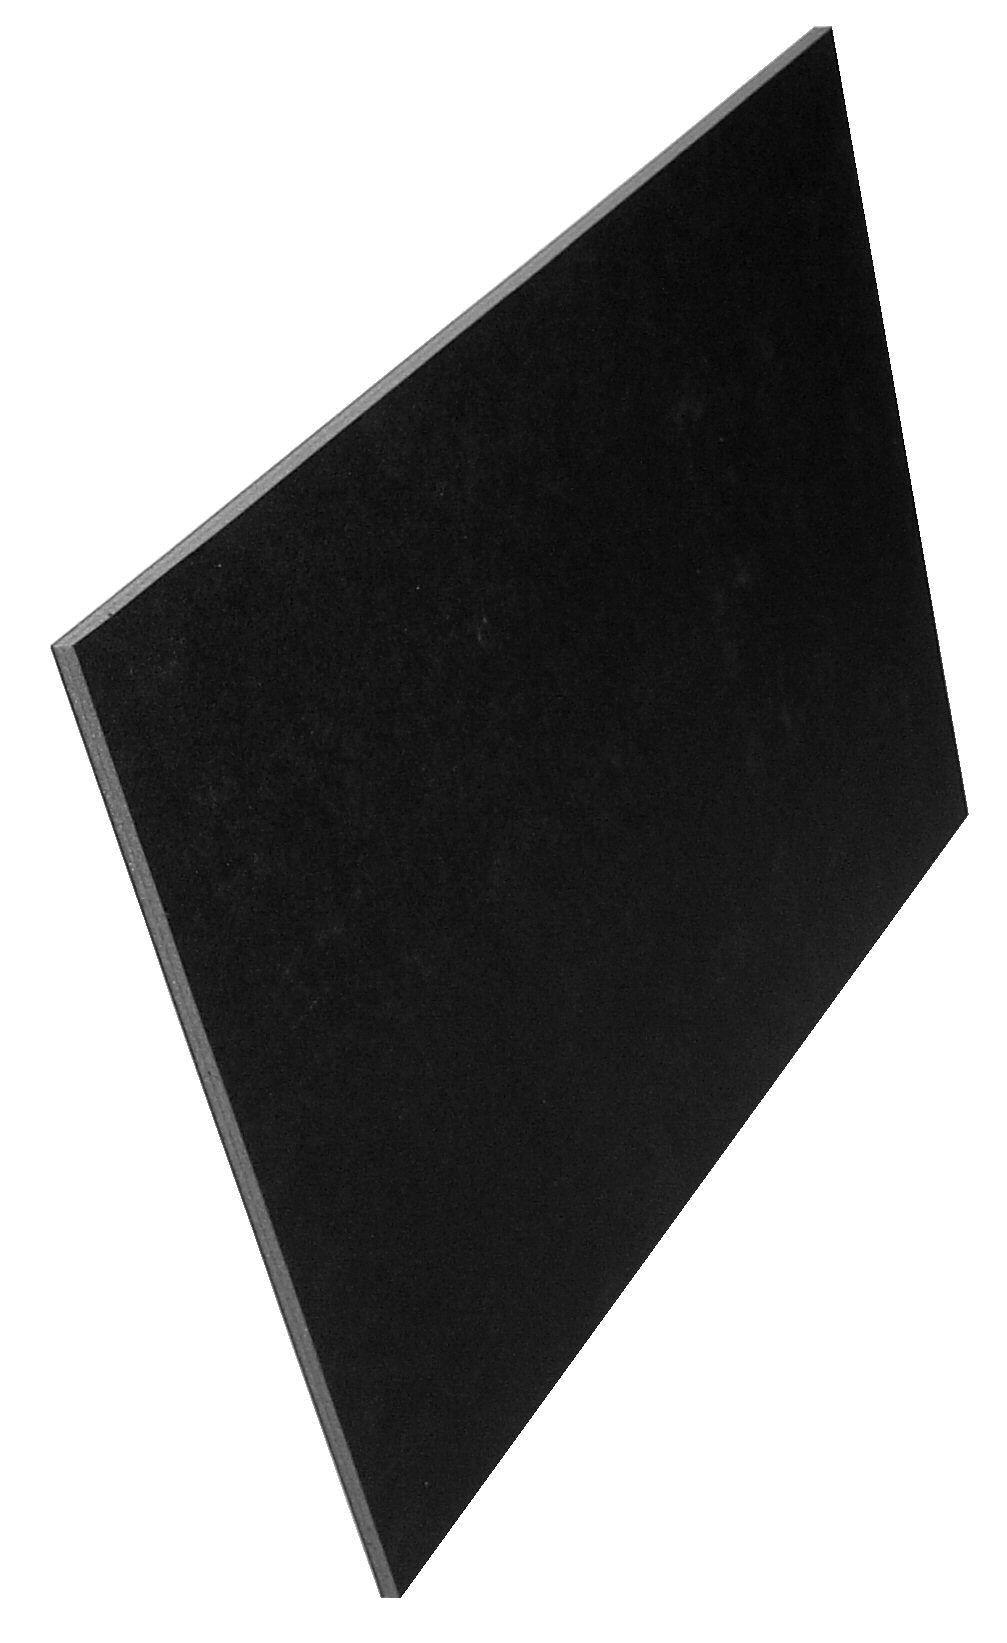 Black Foam Board - 614 x 440 x 5mm - Pack of 5